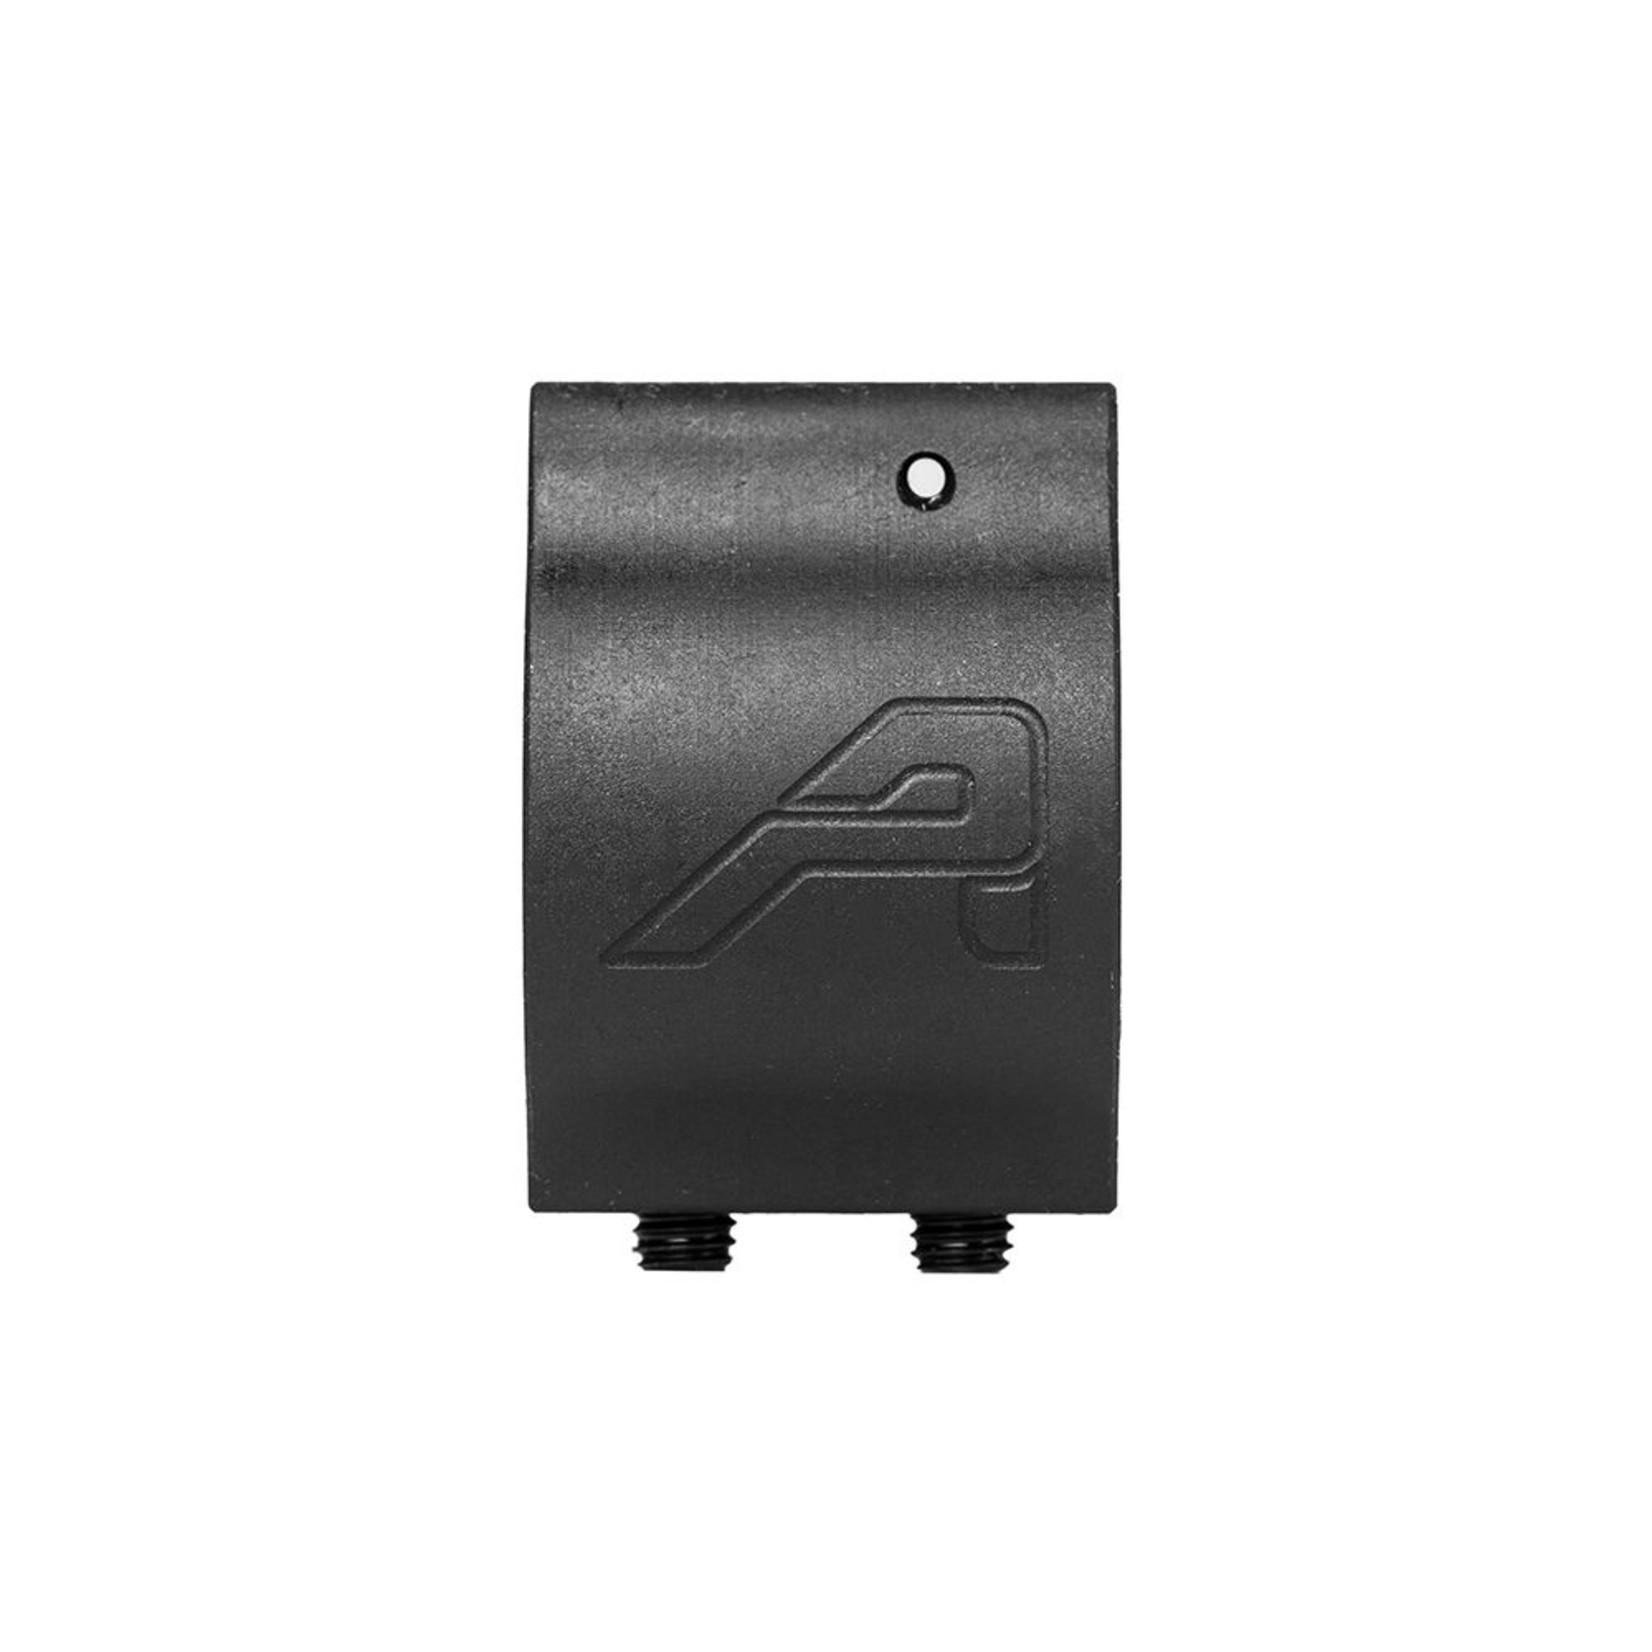 Aero .625 Low Profile Gas Black, Aero Precision